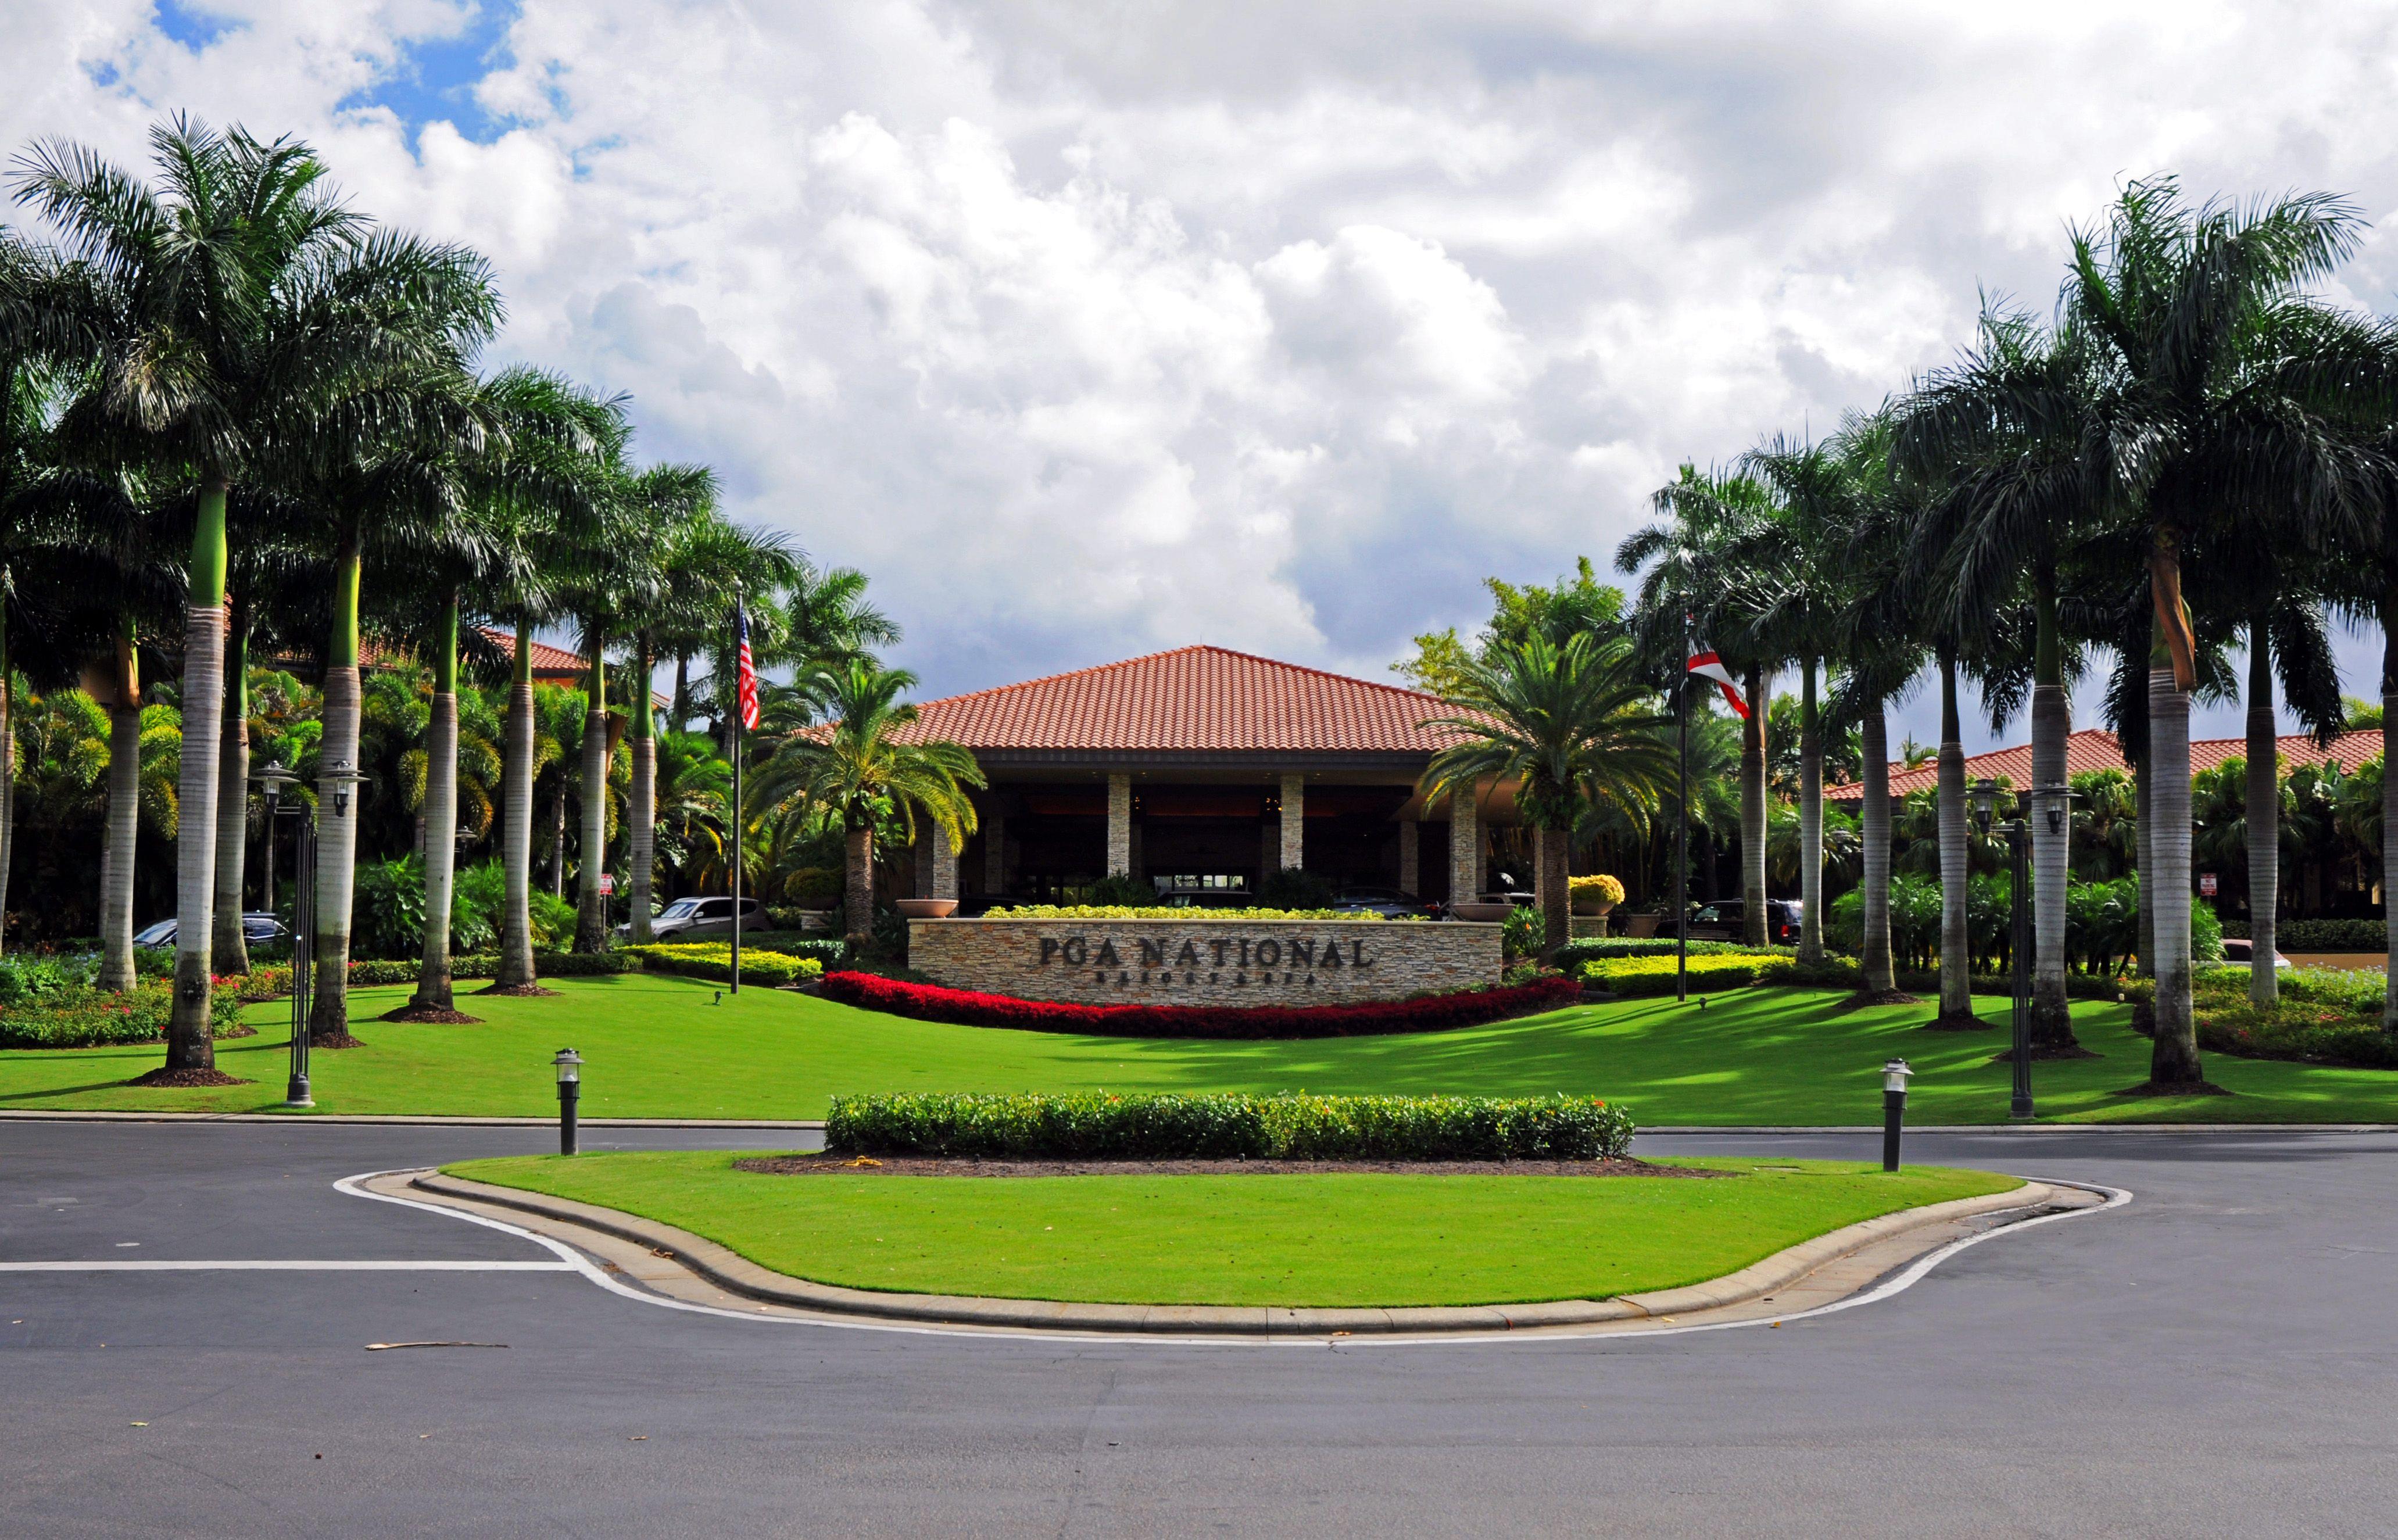 PGA National here in Palm Beach Gardens http://palmbeachflorida.com ...